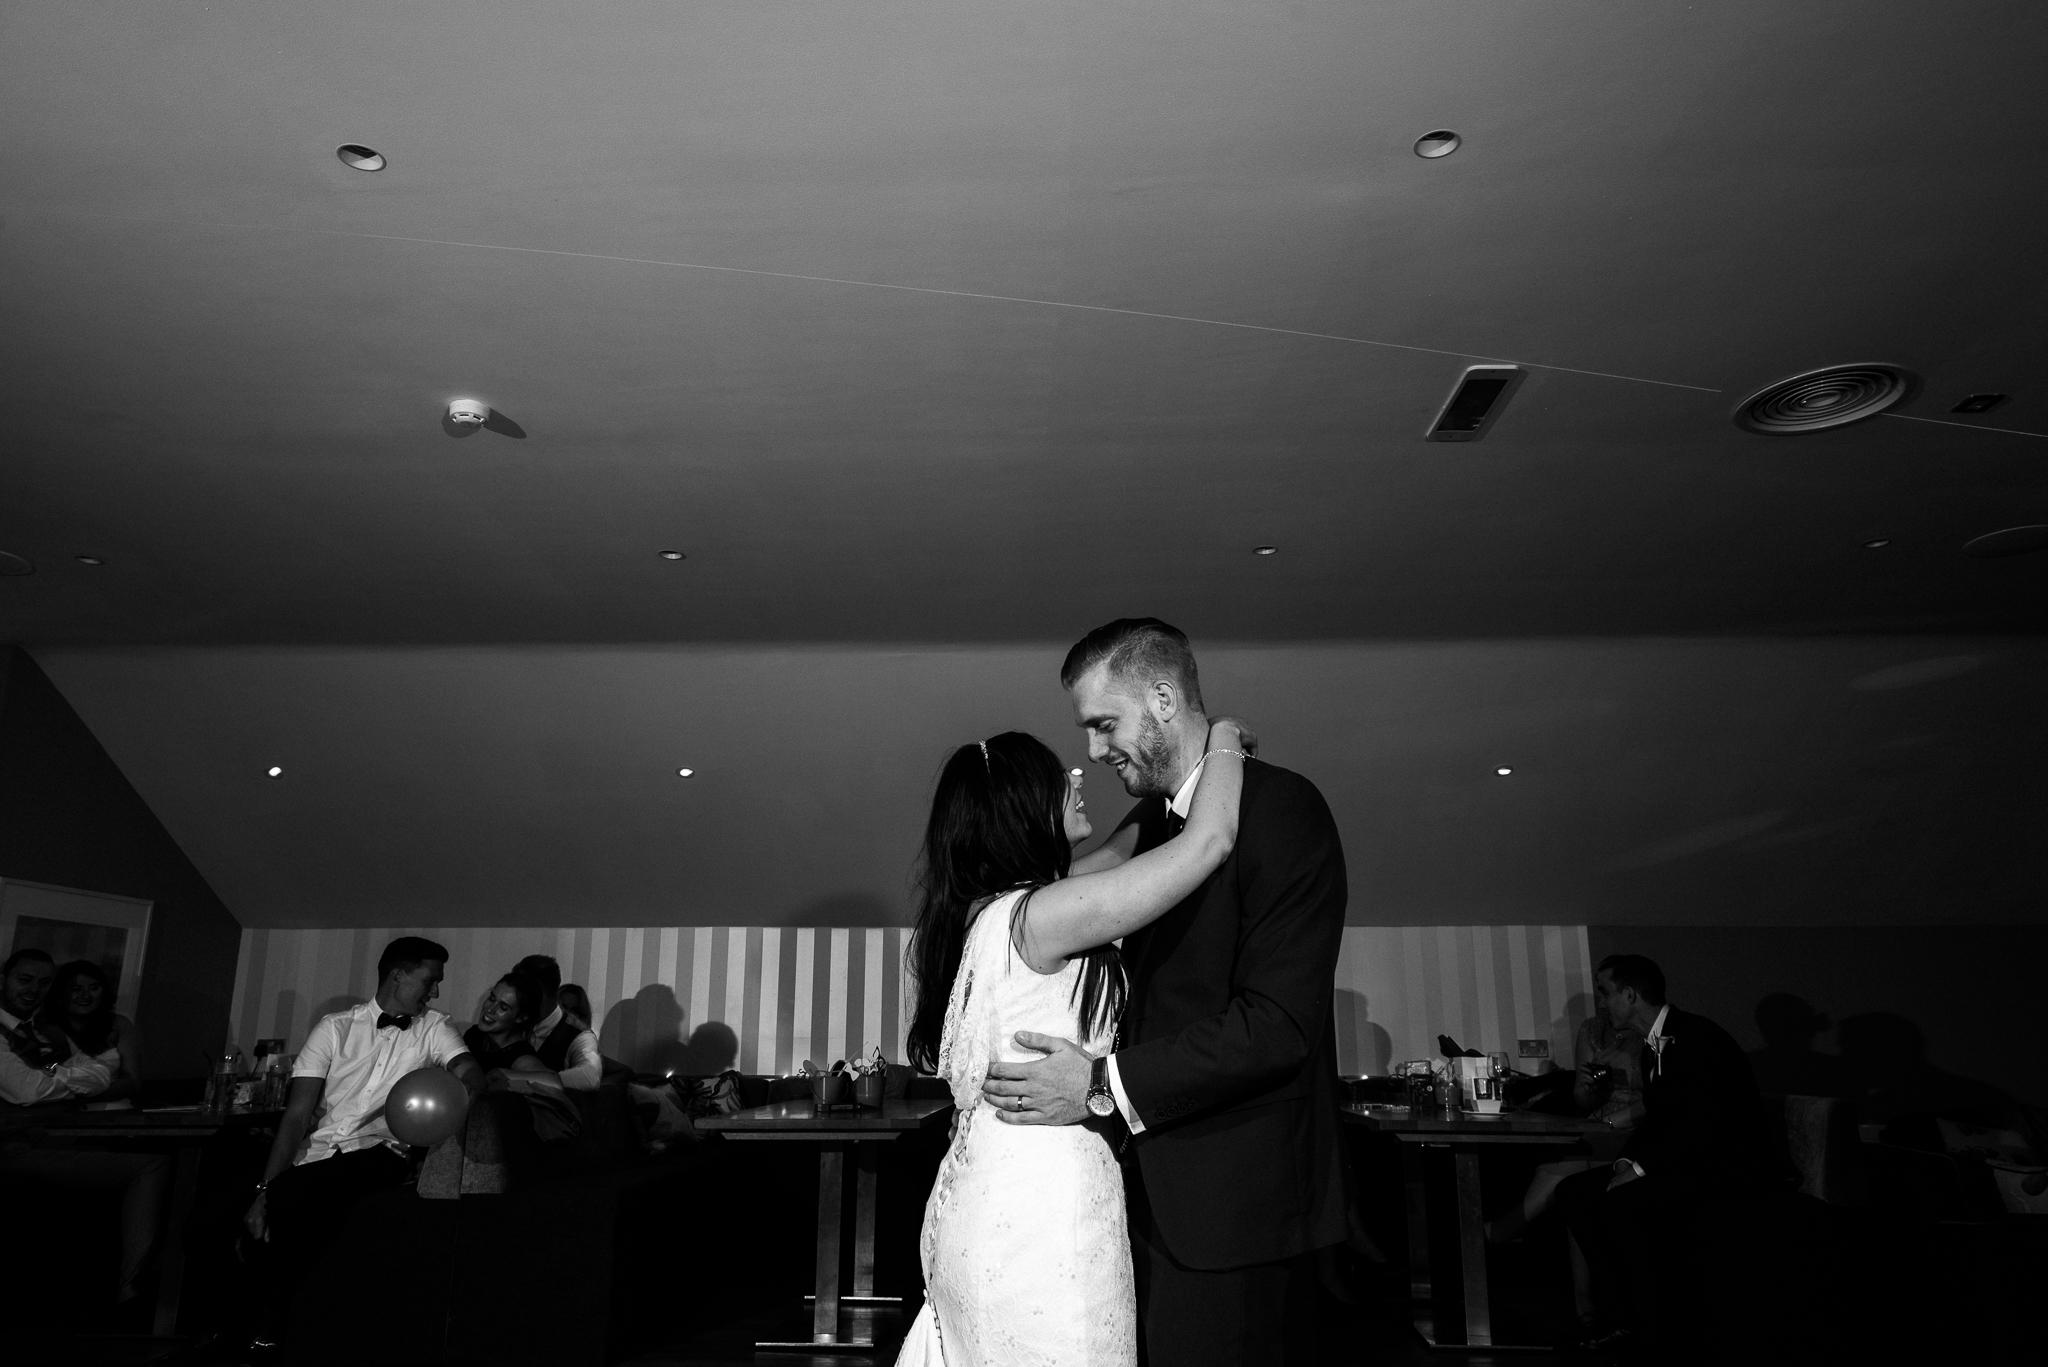 Destination Wedding Photography in Padstow, Cornwall at Retallack Resort-58.jpg